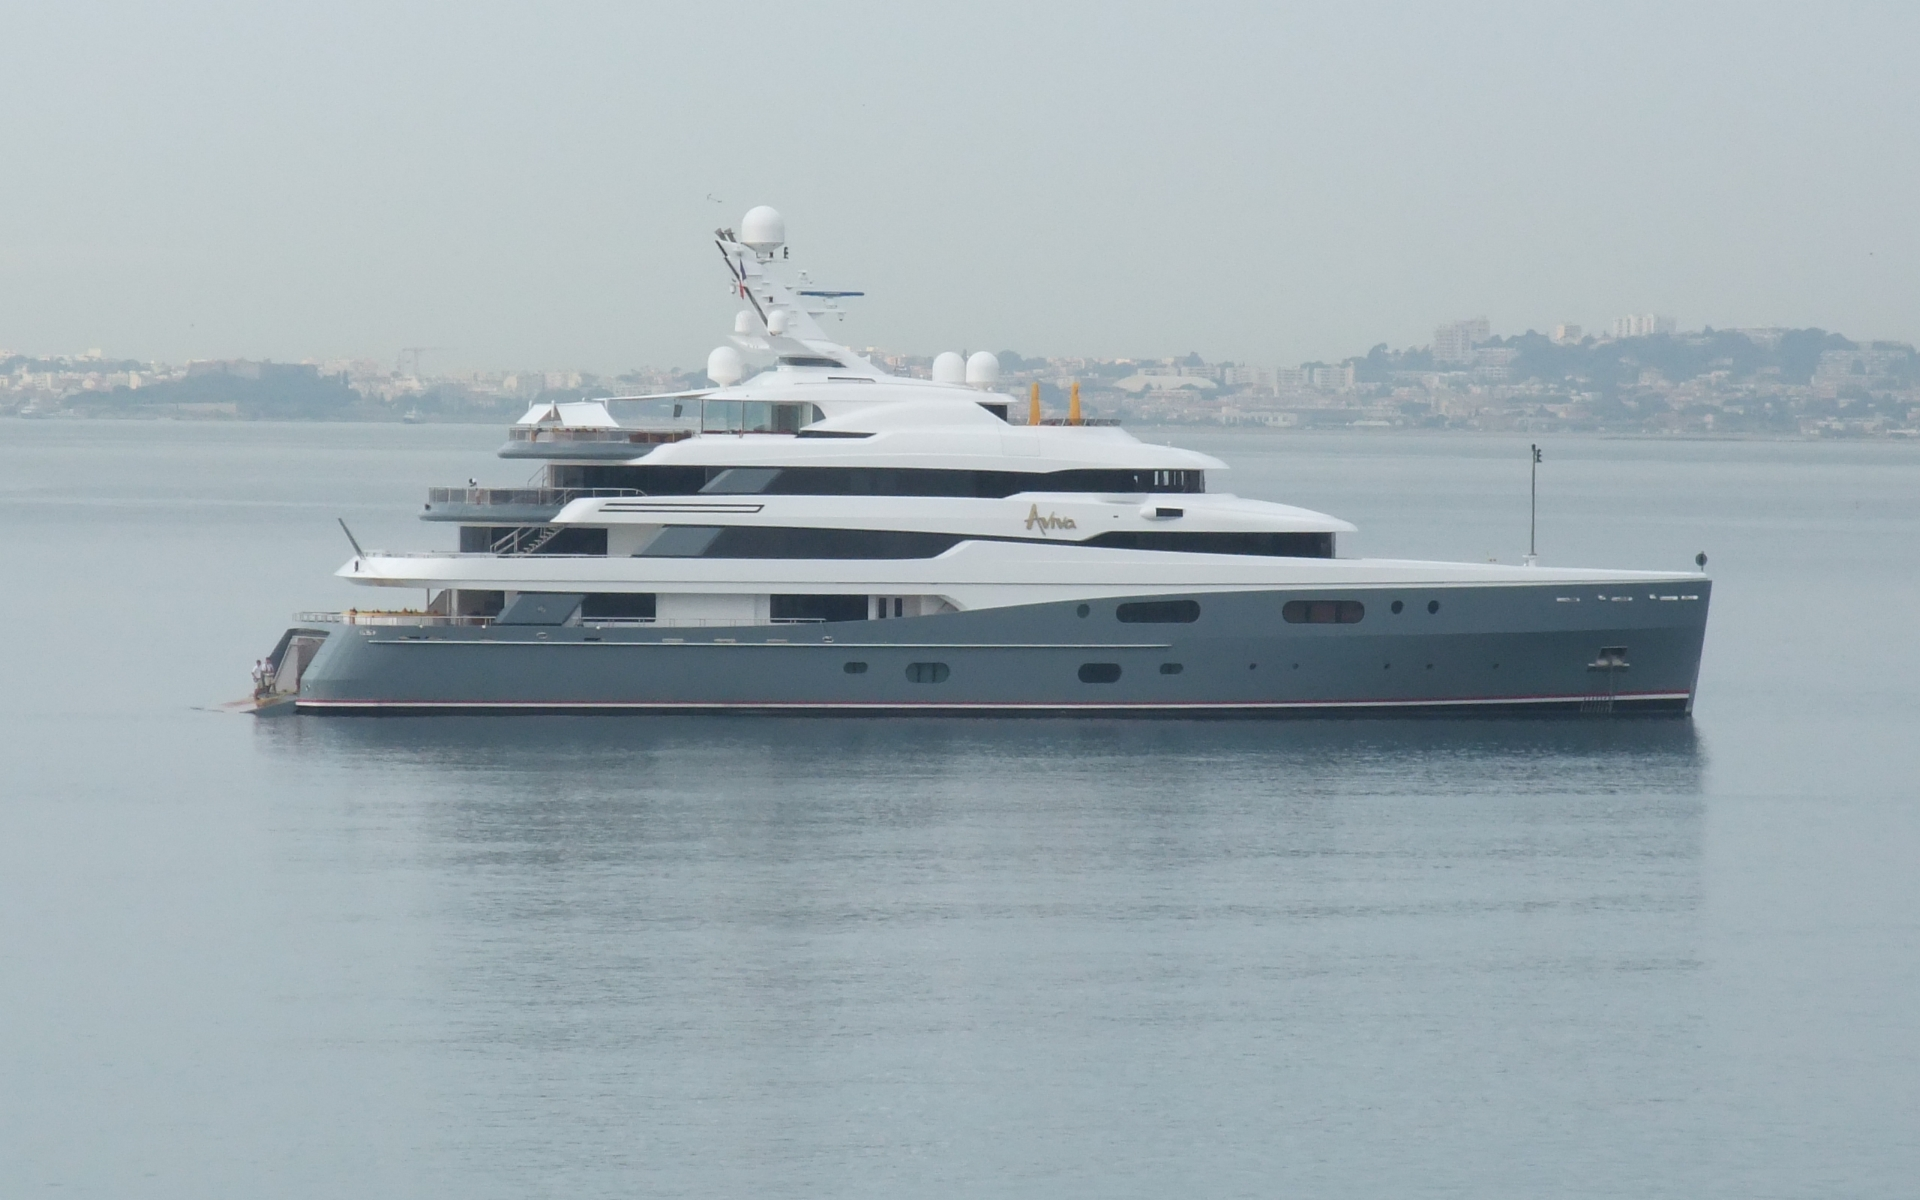 Aviva 68m Yacht Wikipedia